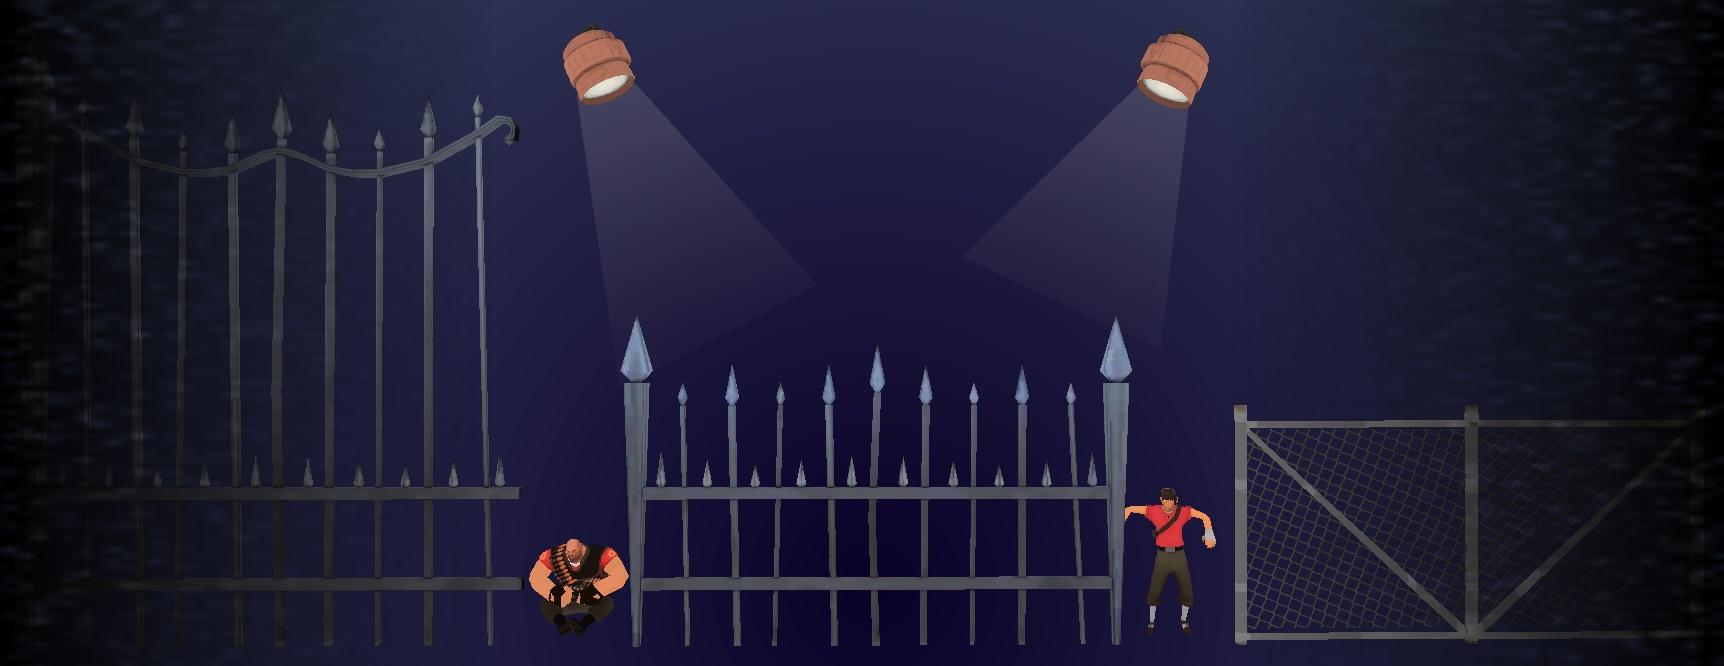 iron_fence02.jpg